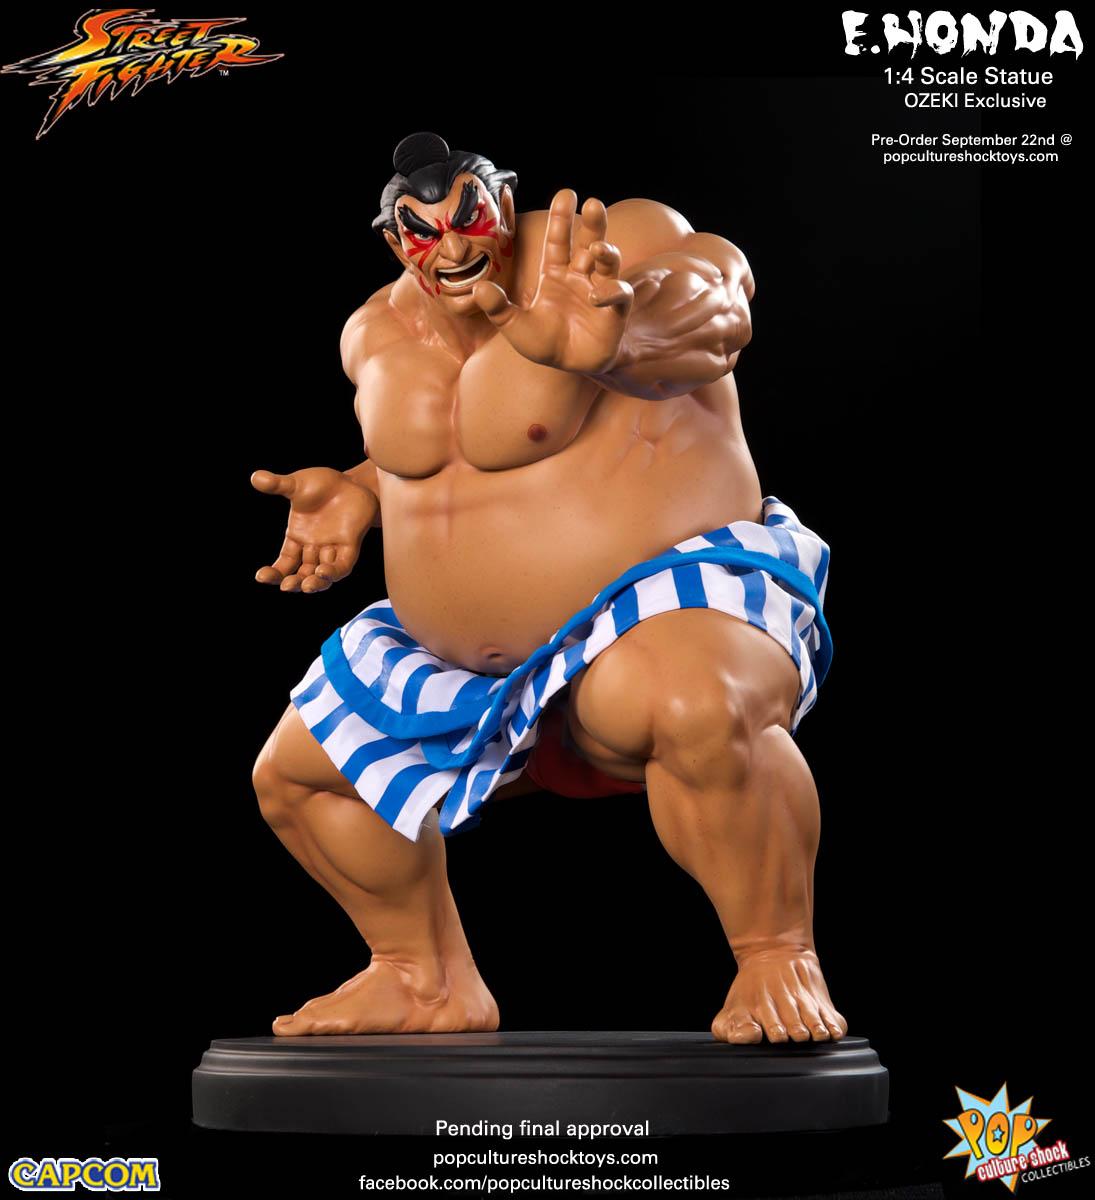 [Pop Culture Shock] Street Fighter: E. Honda 1/4 Statue - Página 3 Street-Fighter-E.-Honda-ozeki-Statue-001